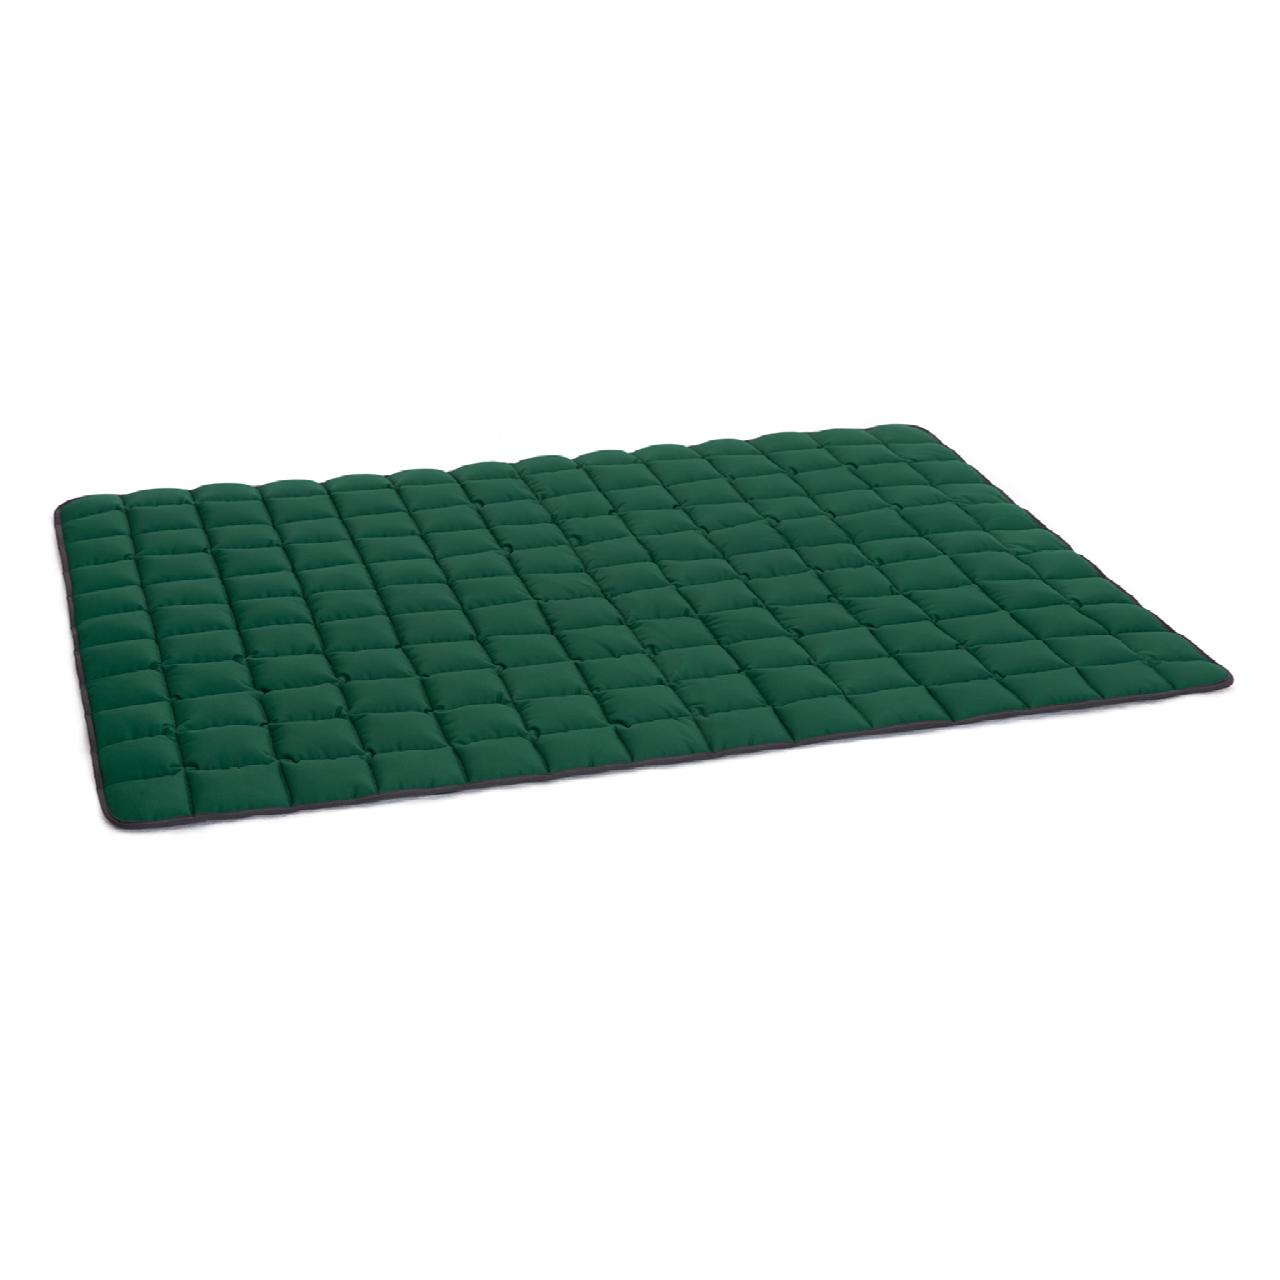 Wende-Steppdecke grau - grün XXL